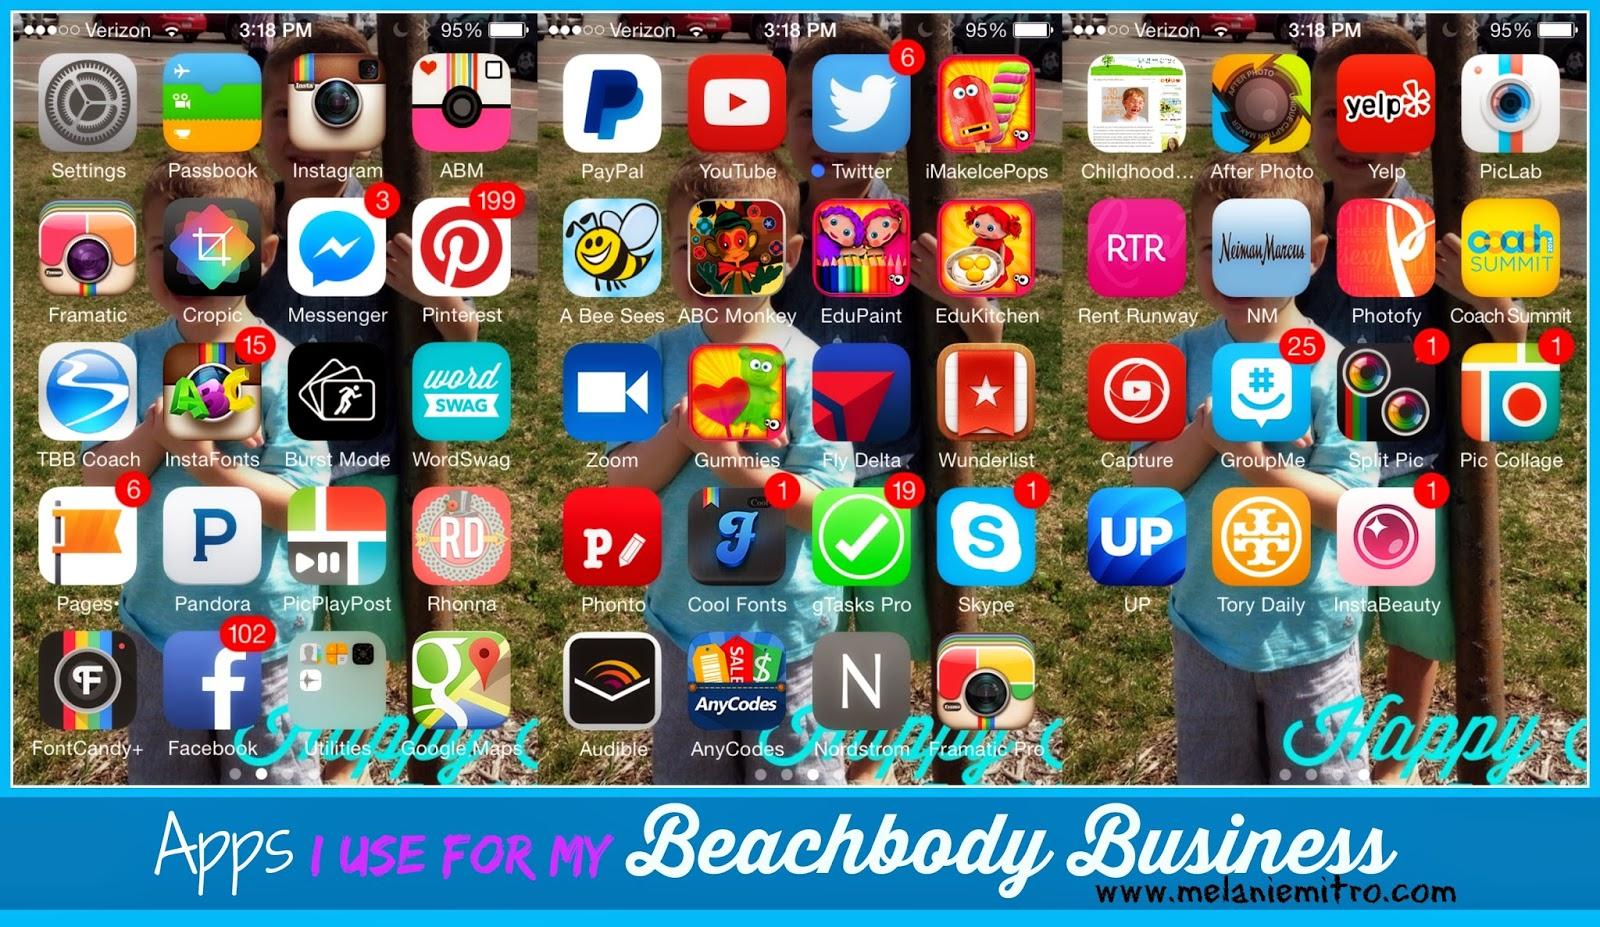 Team Beachbody Favorite Apps to Enhance My Photos